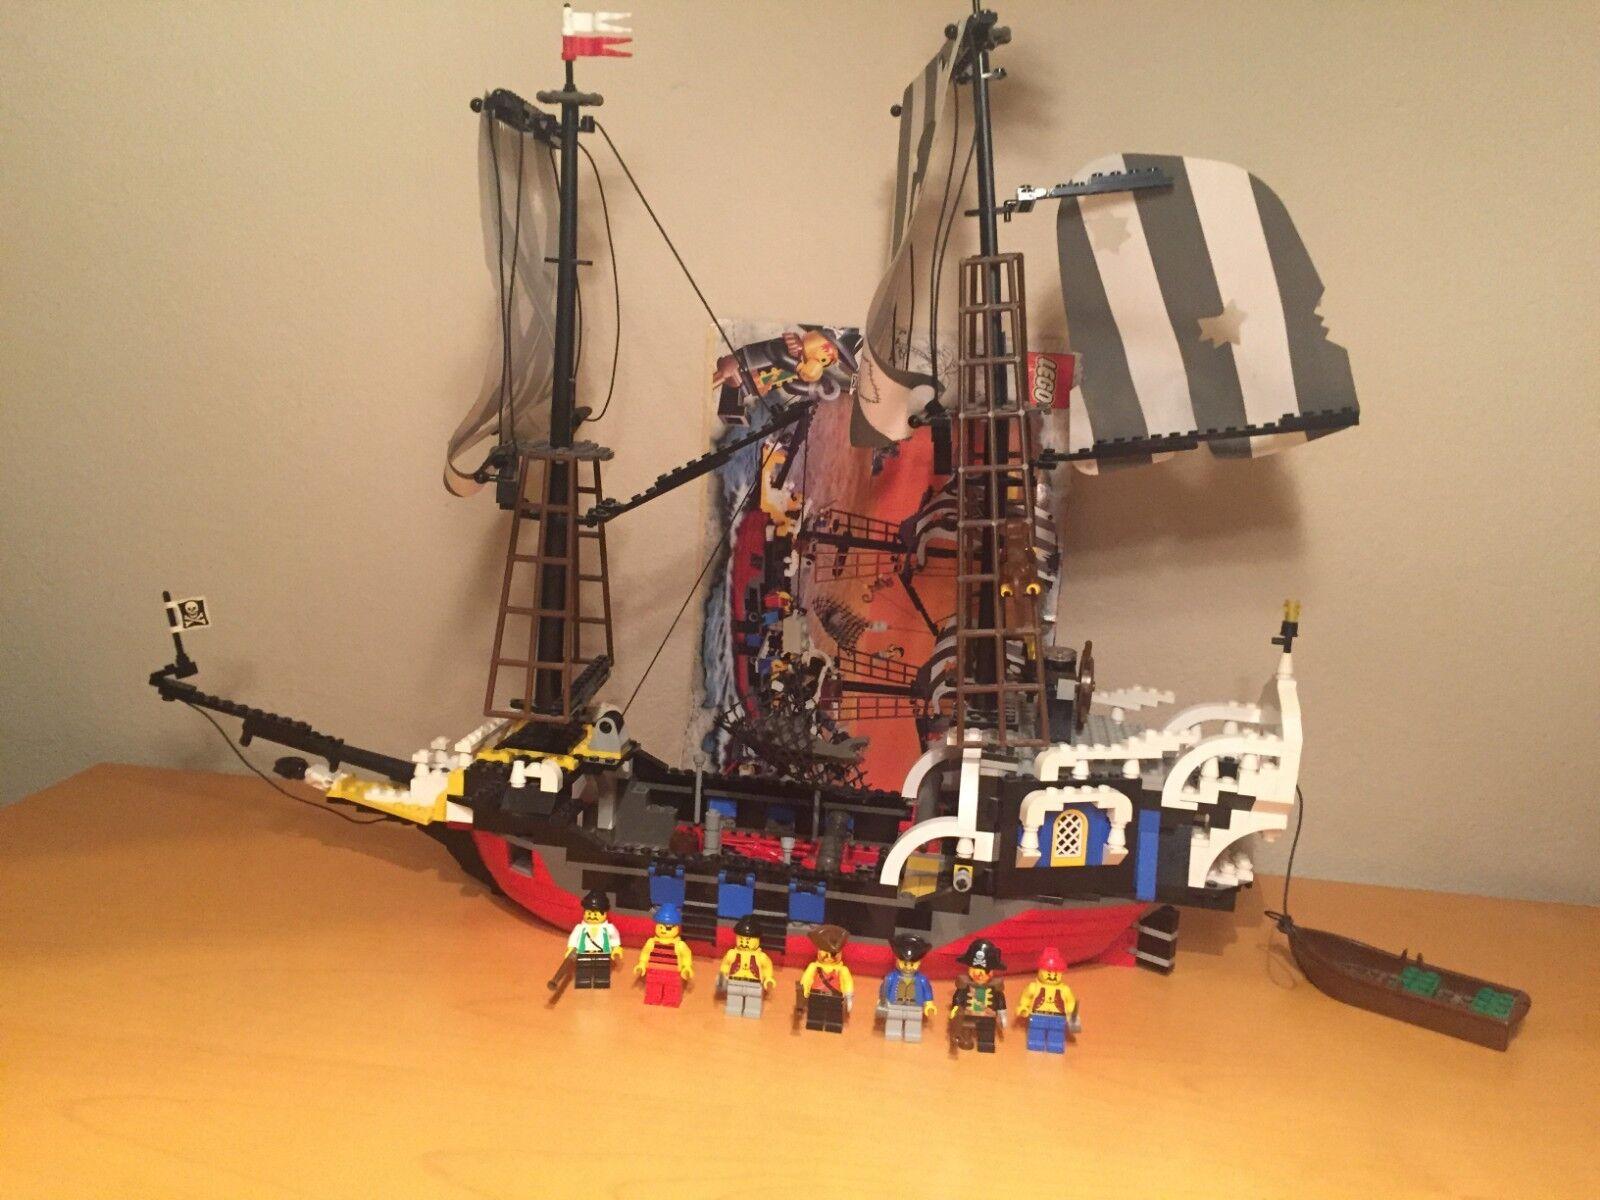 Lego Ange 6290 röd Beard Runner - 100% komplet komplett med ruta